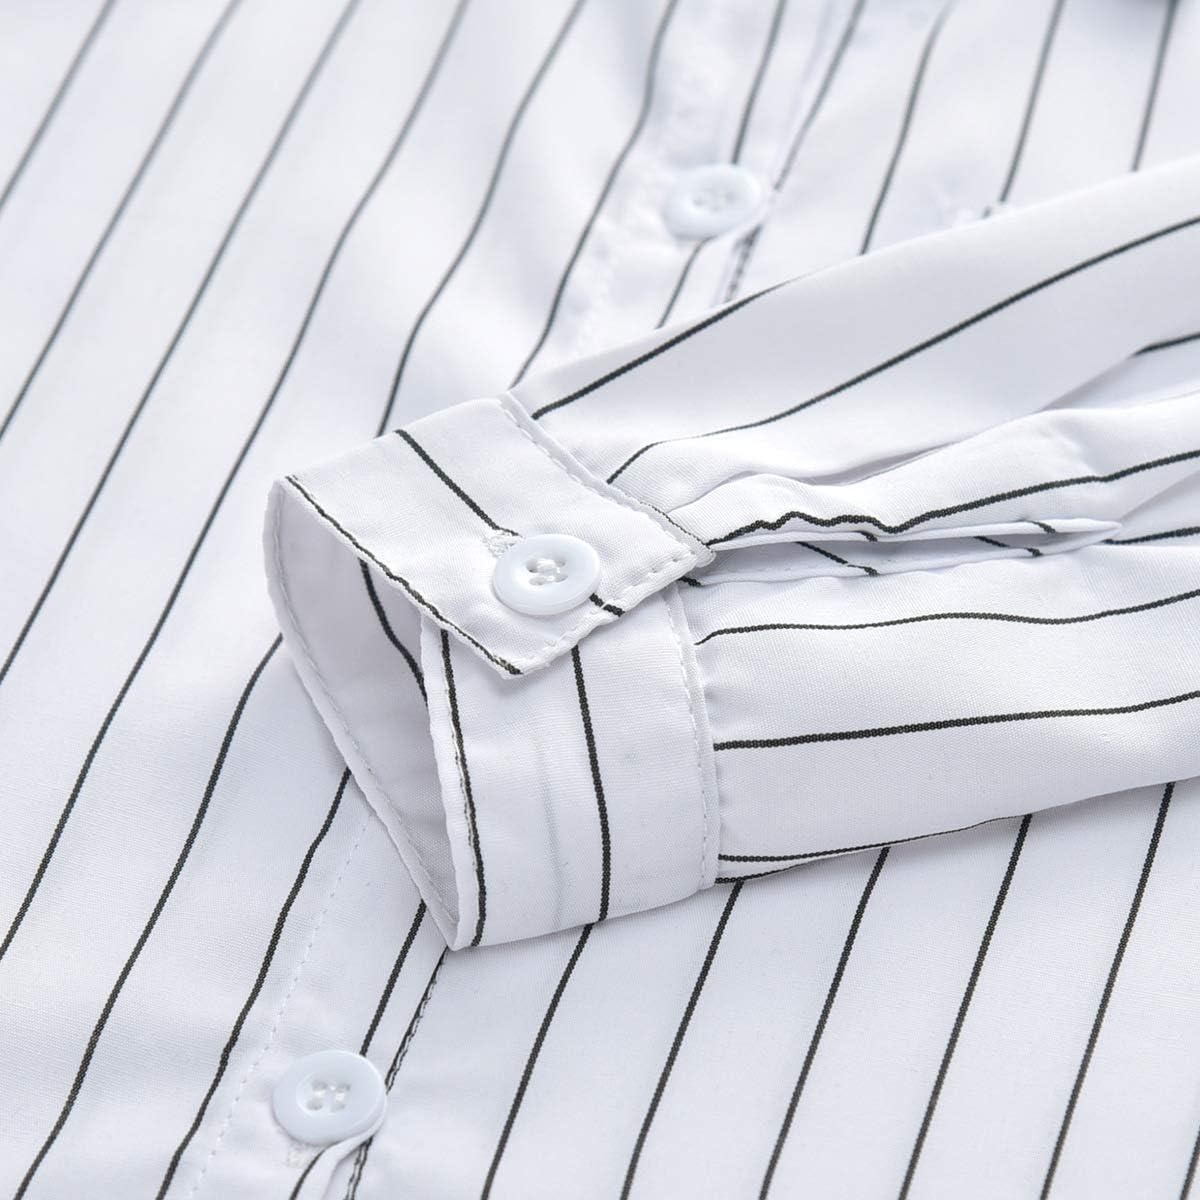 Shirt Pants SANMIO Baby Boys Clothing Sets Bow Tie Necktie Kids Suit Gentleman Festive Wedding Long Sleeve Bodysuit for Spring Autumn